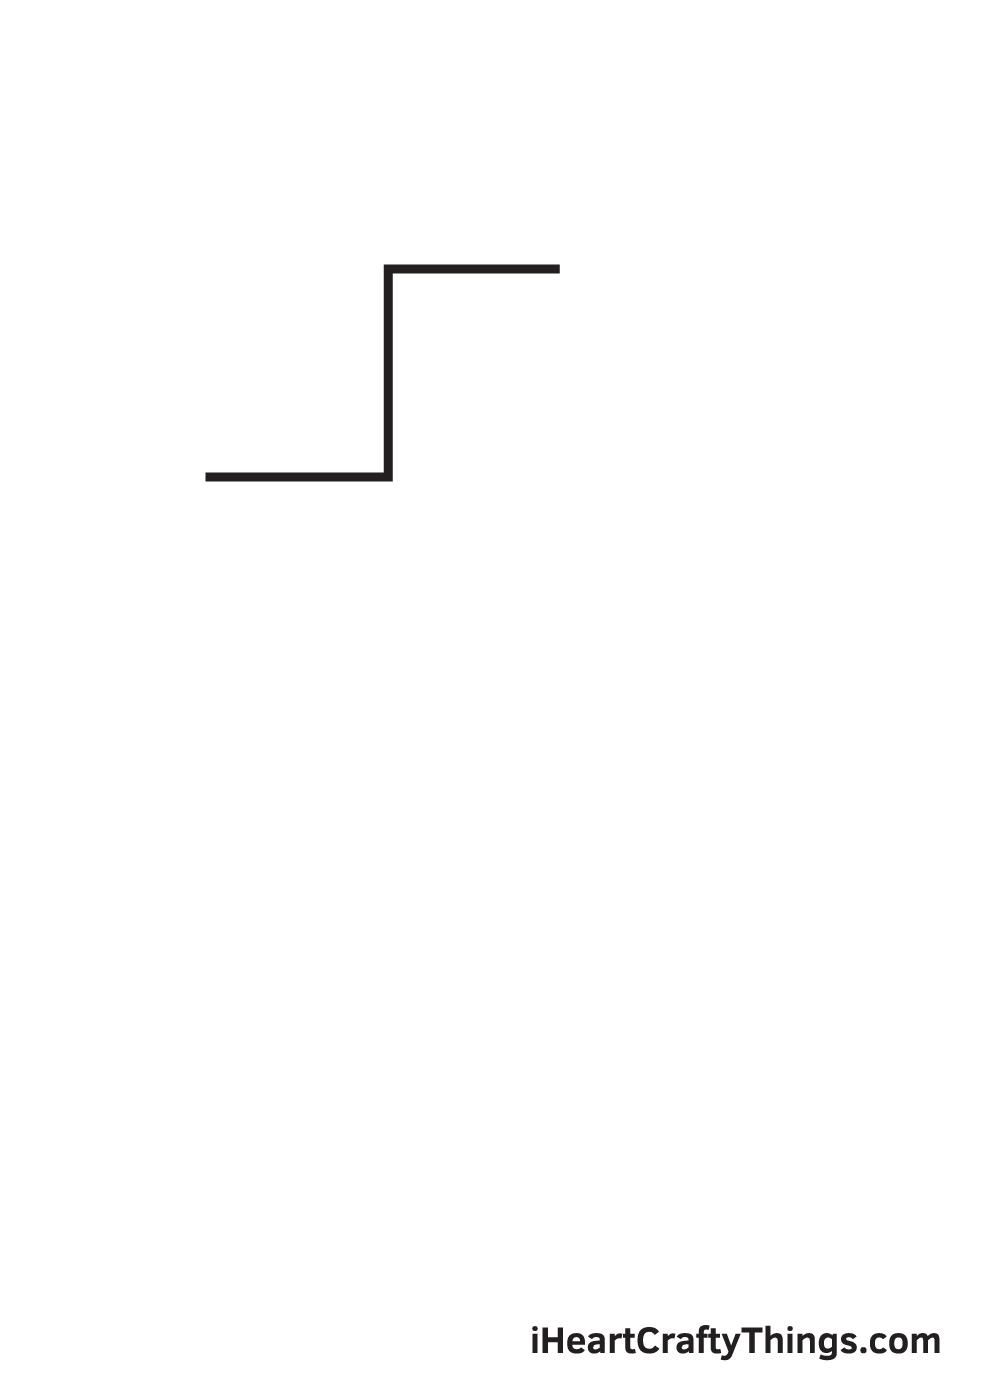 cross drawing - step 1